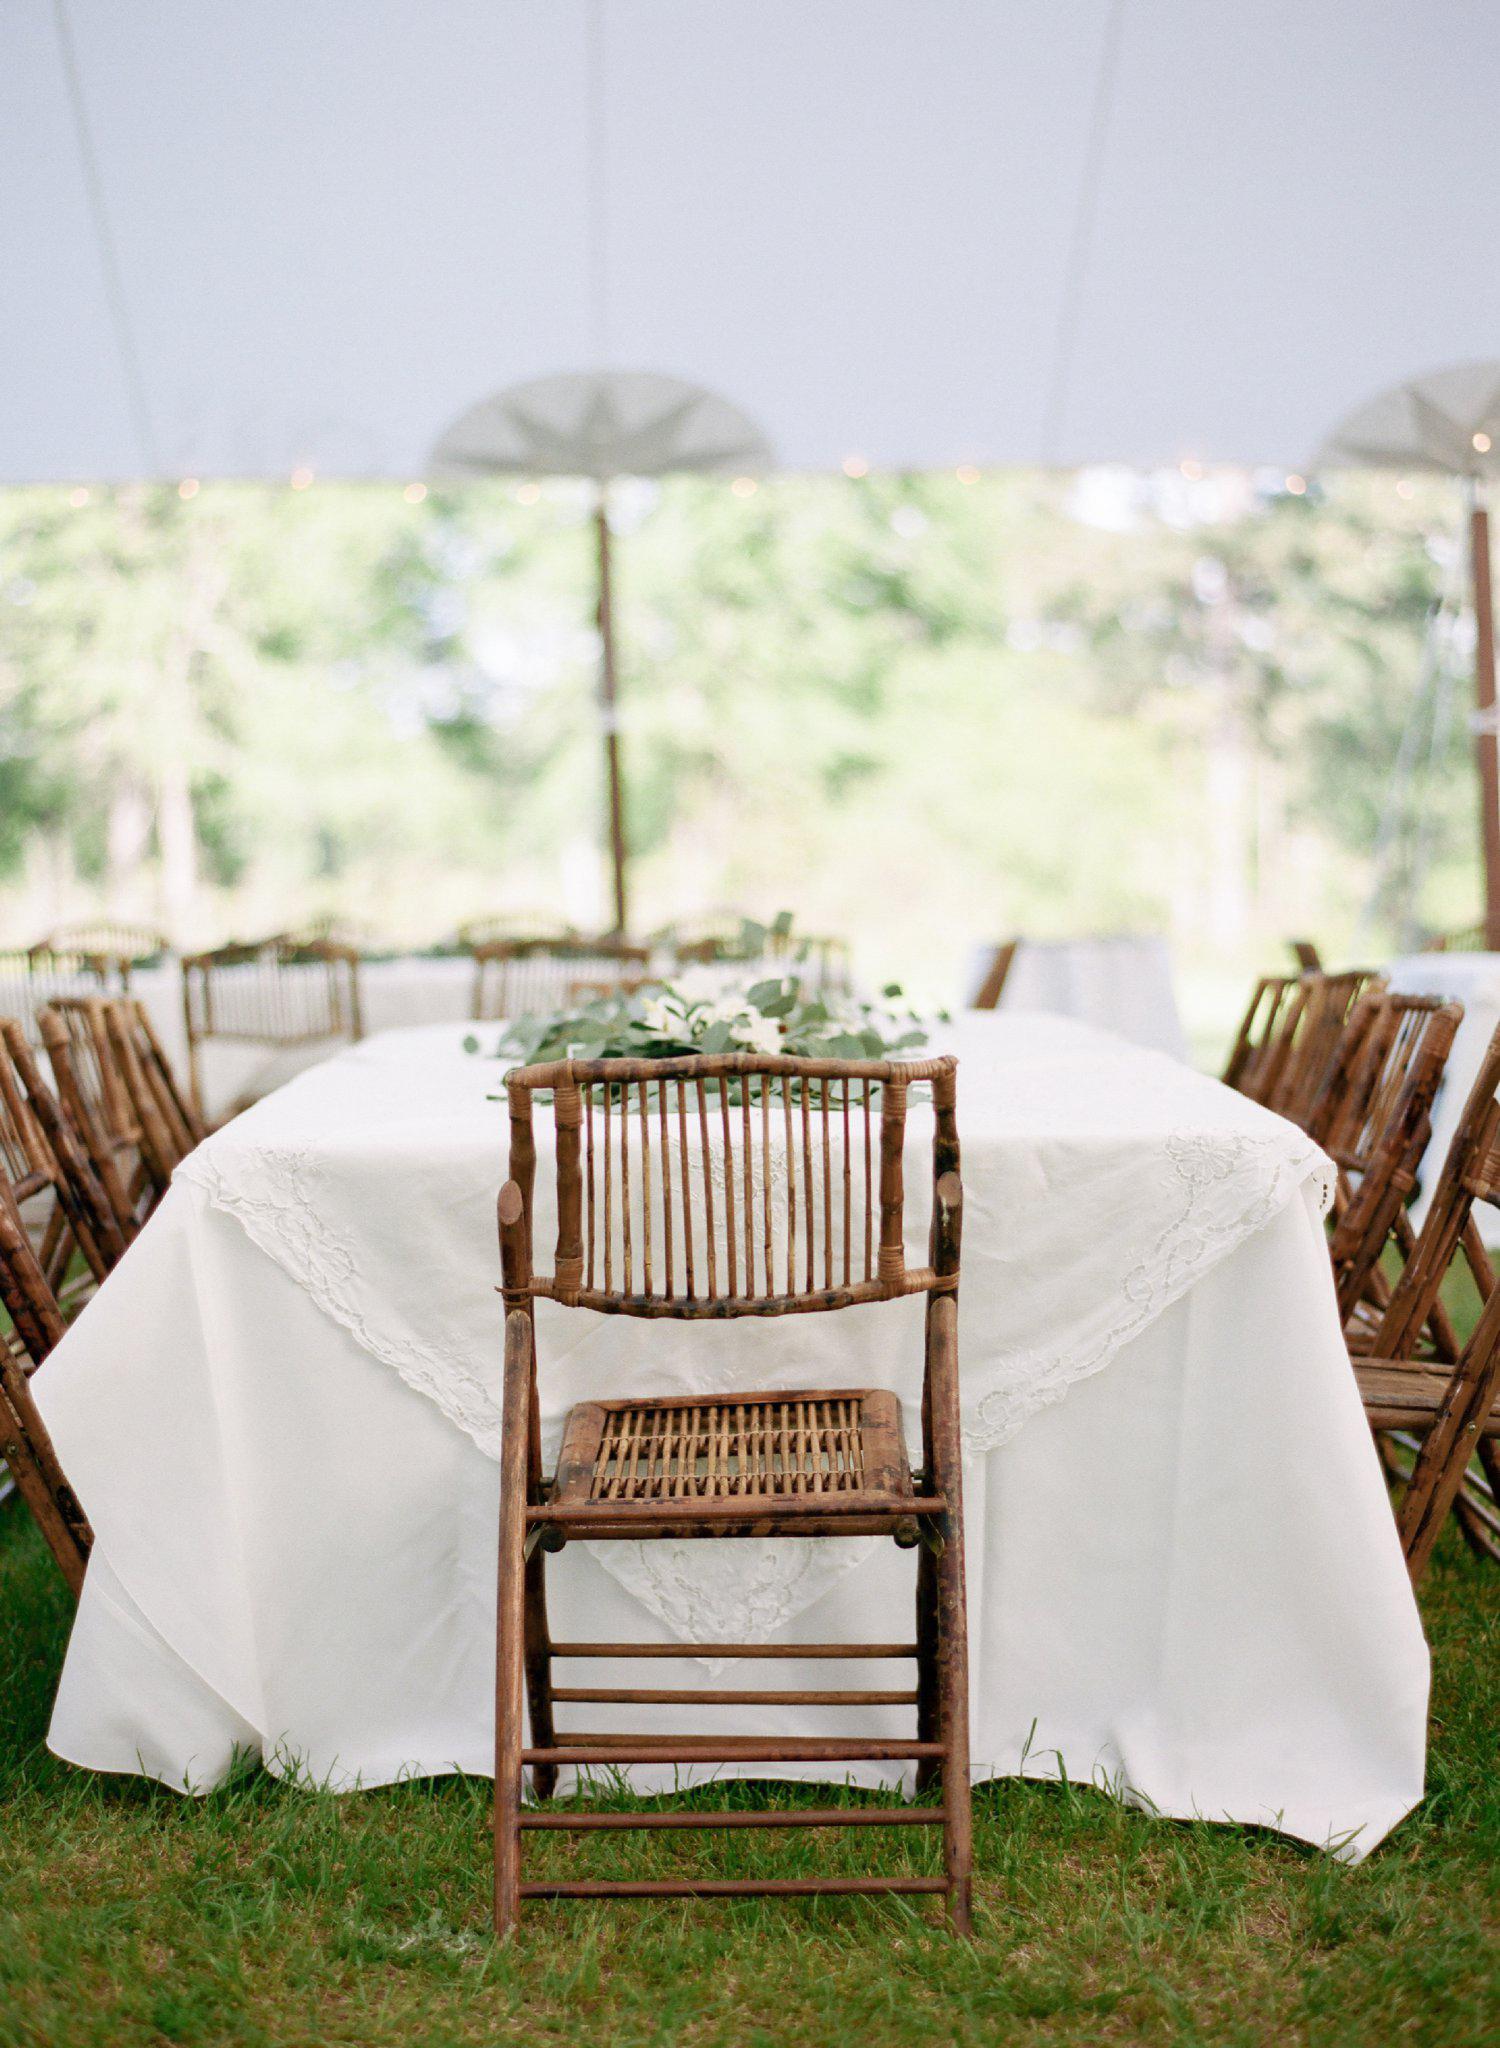 ecila farm wedding albany georgia wedding photographer shannon griffin photography-45.jpg